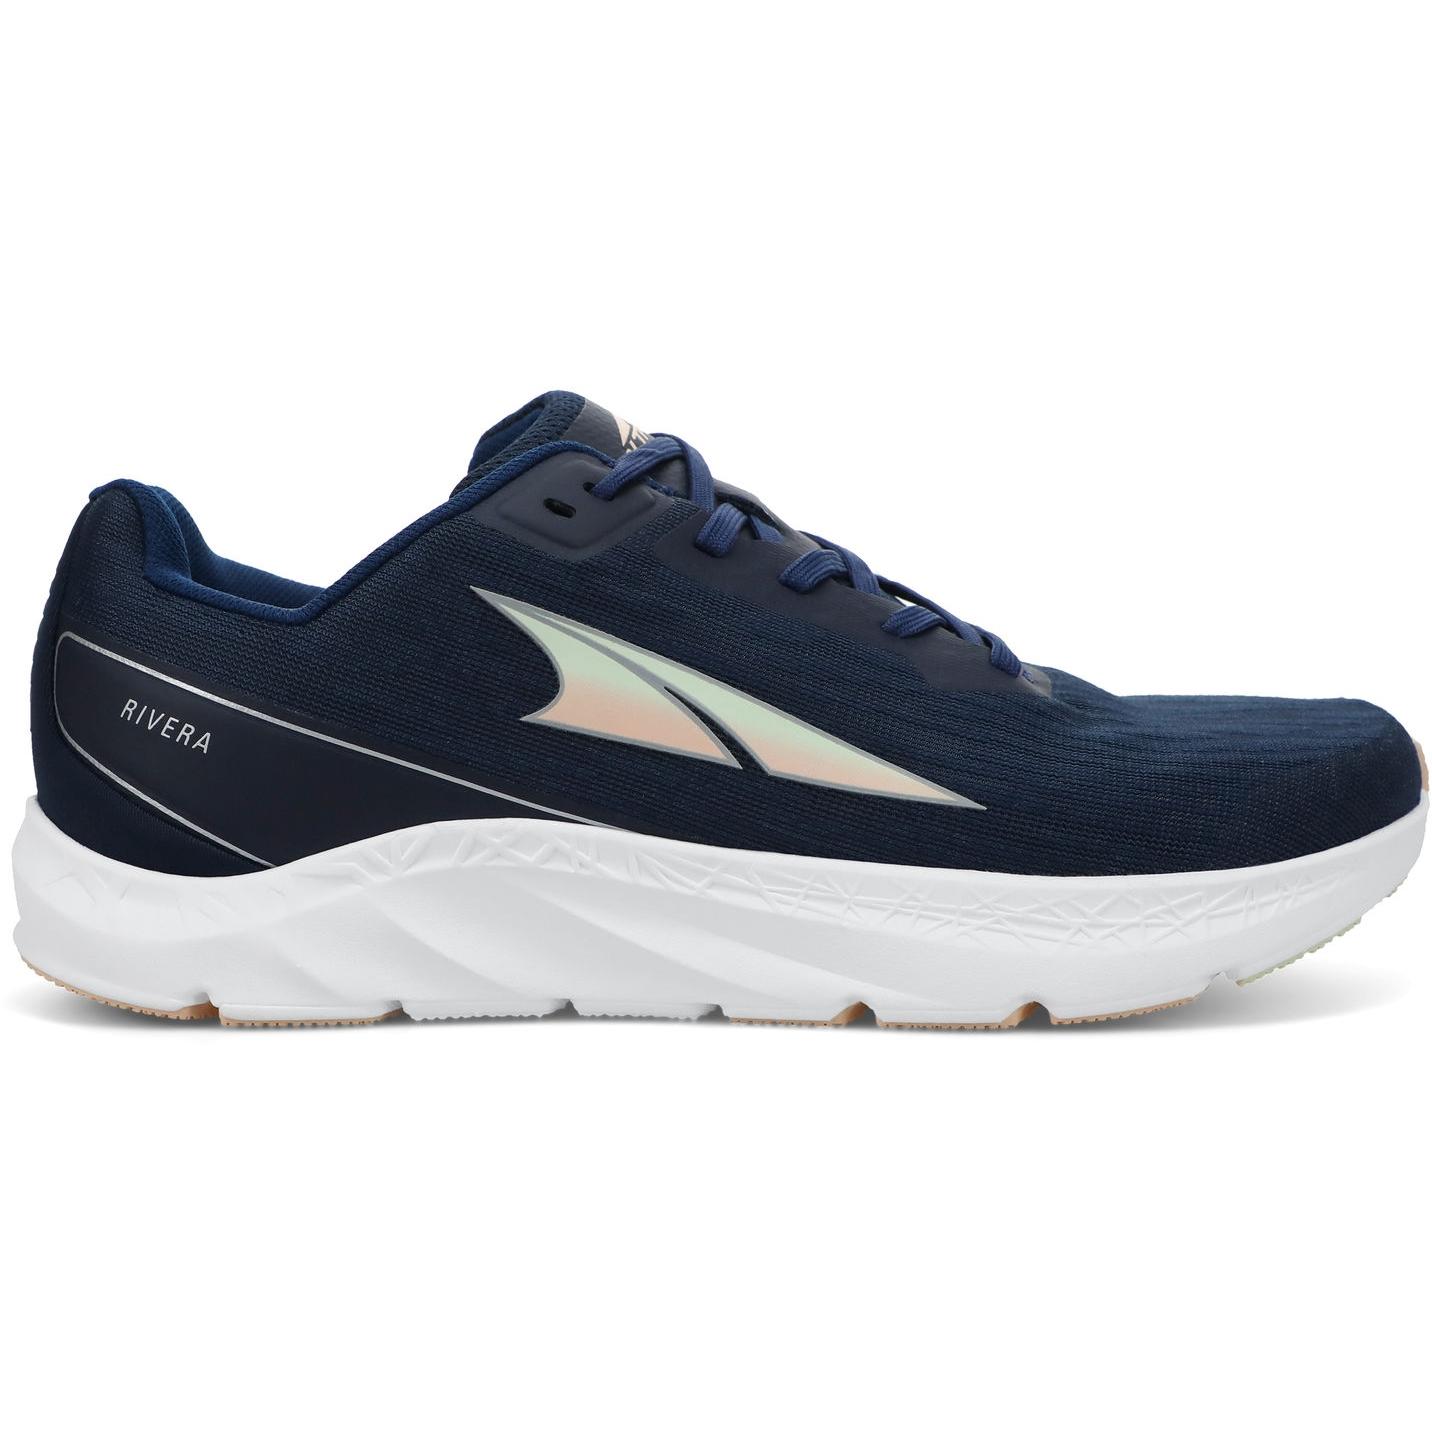 Altra Rivera Running Shoes Women - Navy